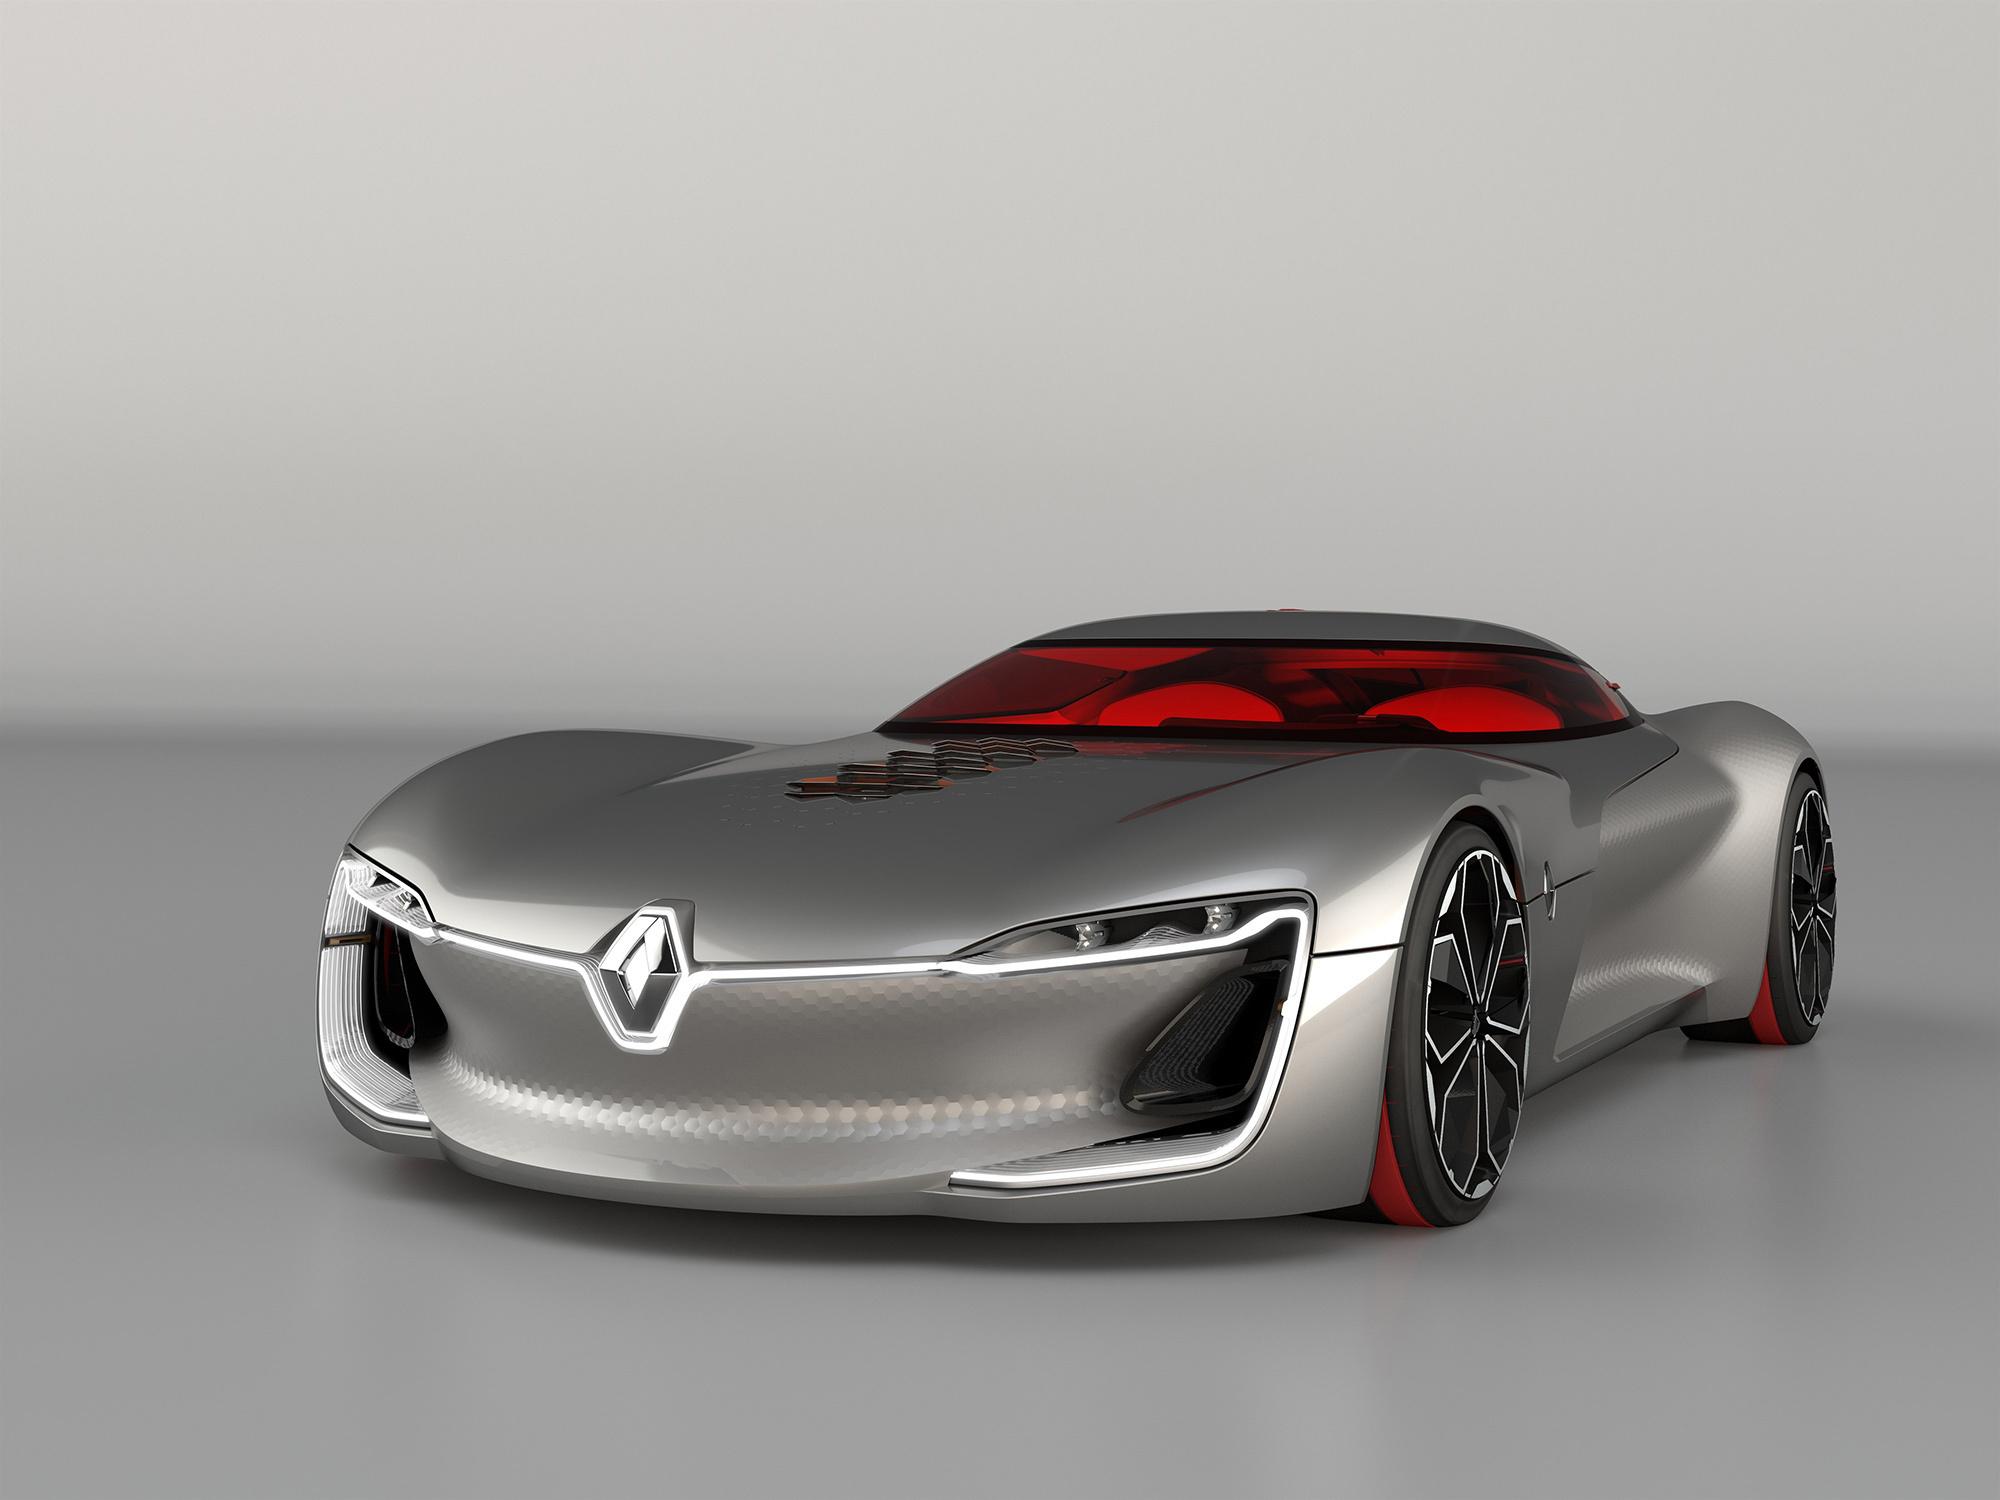 Renault Trezor Concept Wallpaper For Computer